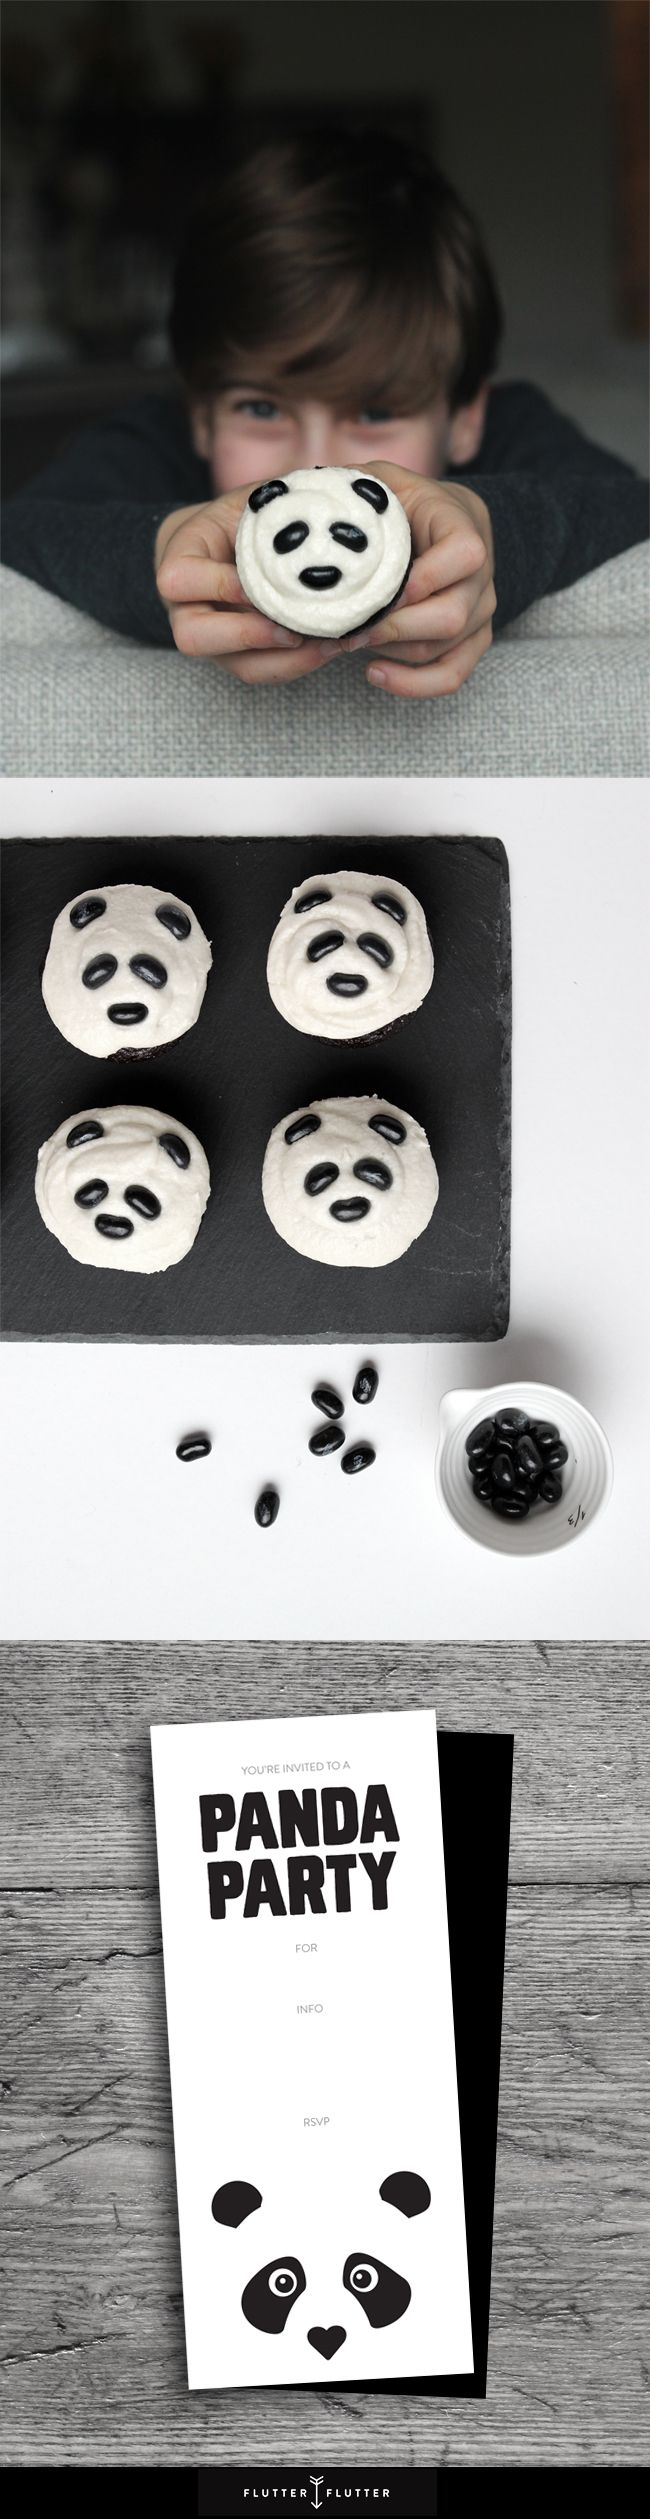 Panda Themed Kids Birthday Party, cupcakes, and invitation.